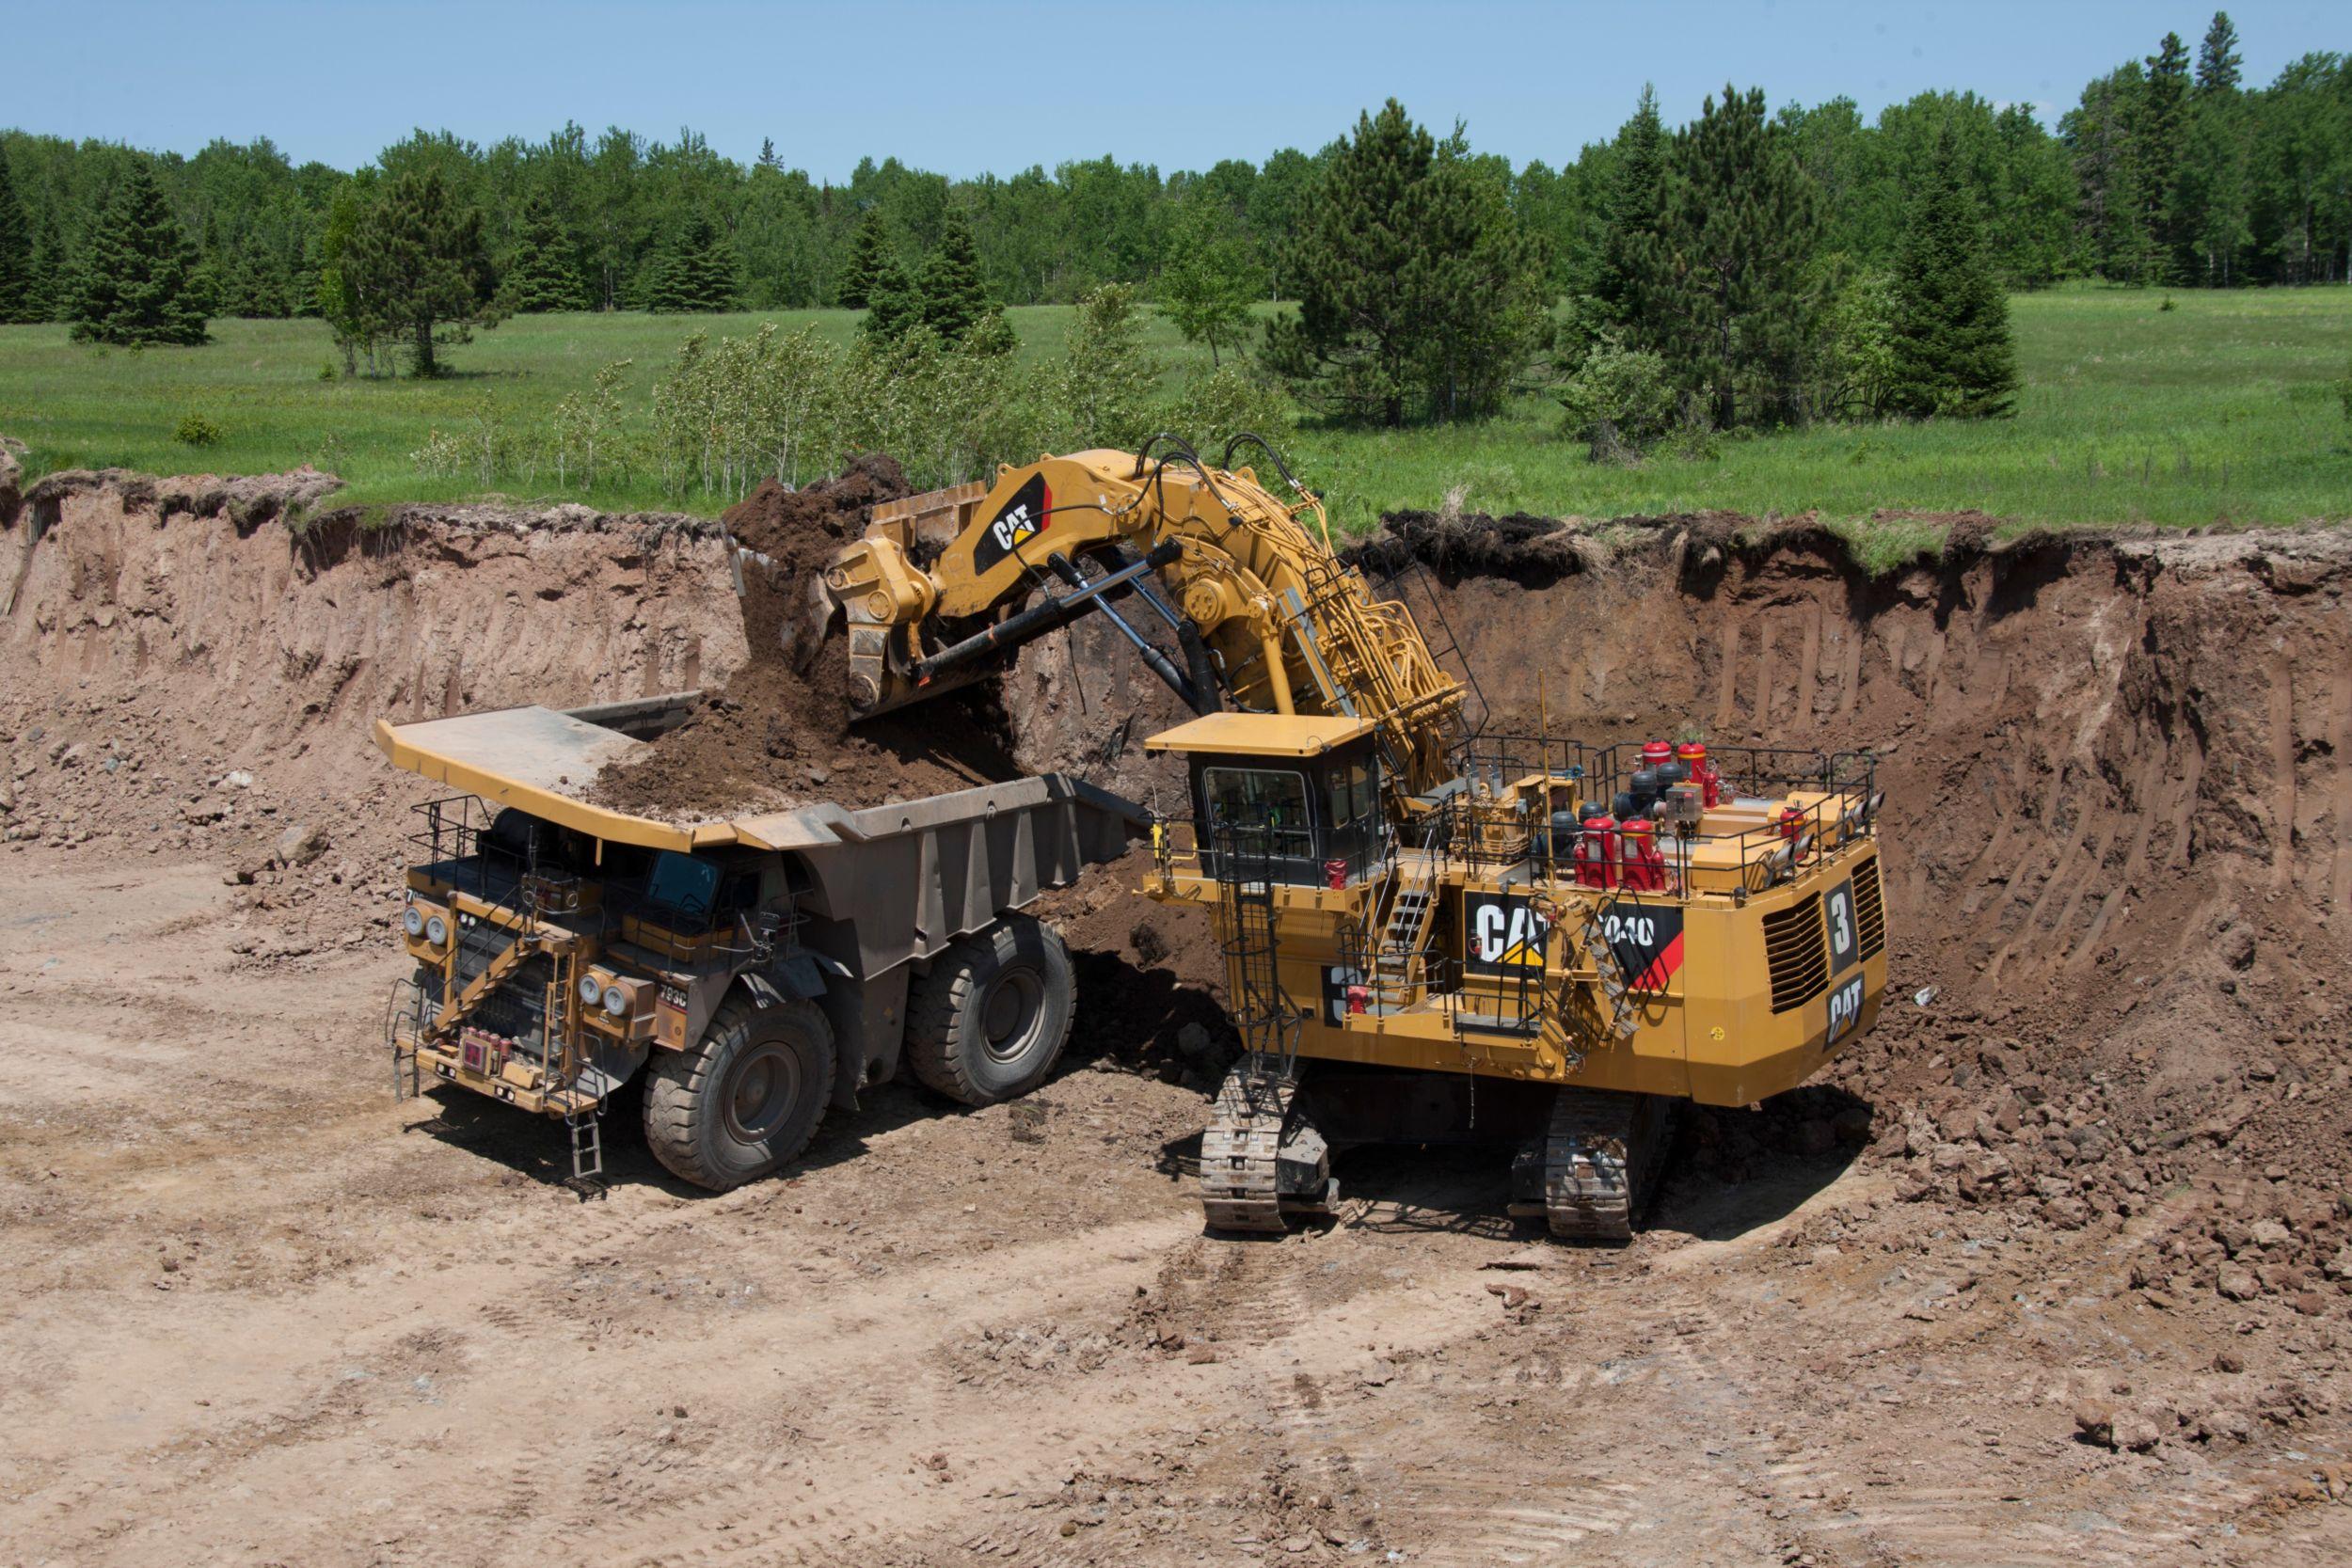 product-6040/6040 FS Hydraulic Mining Shovels